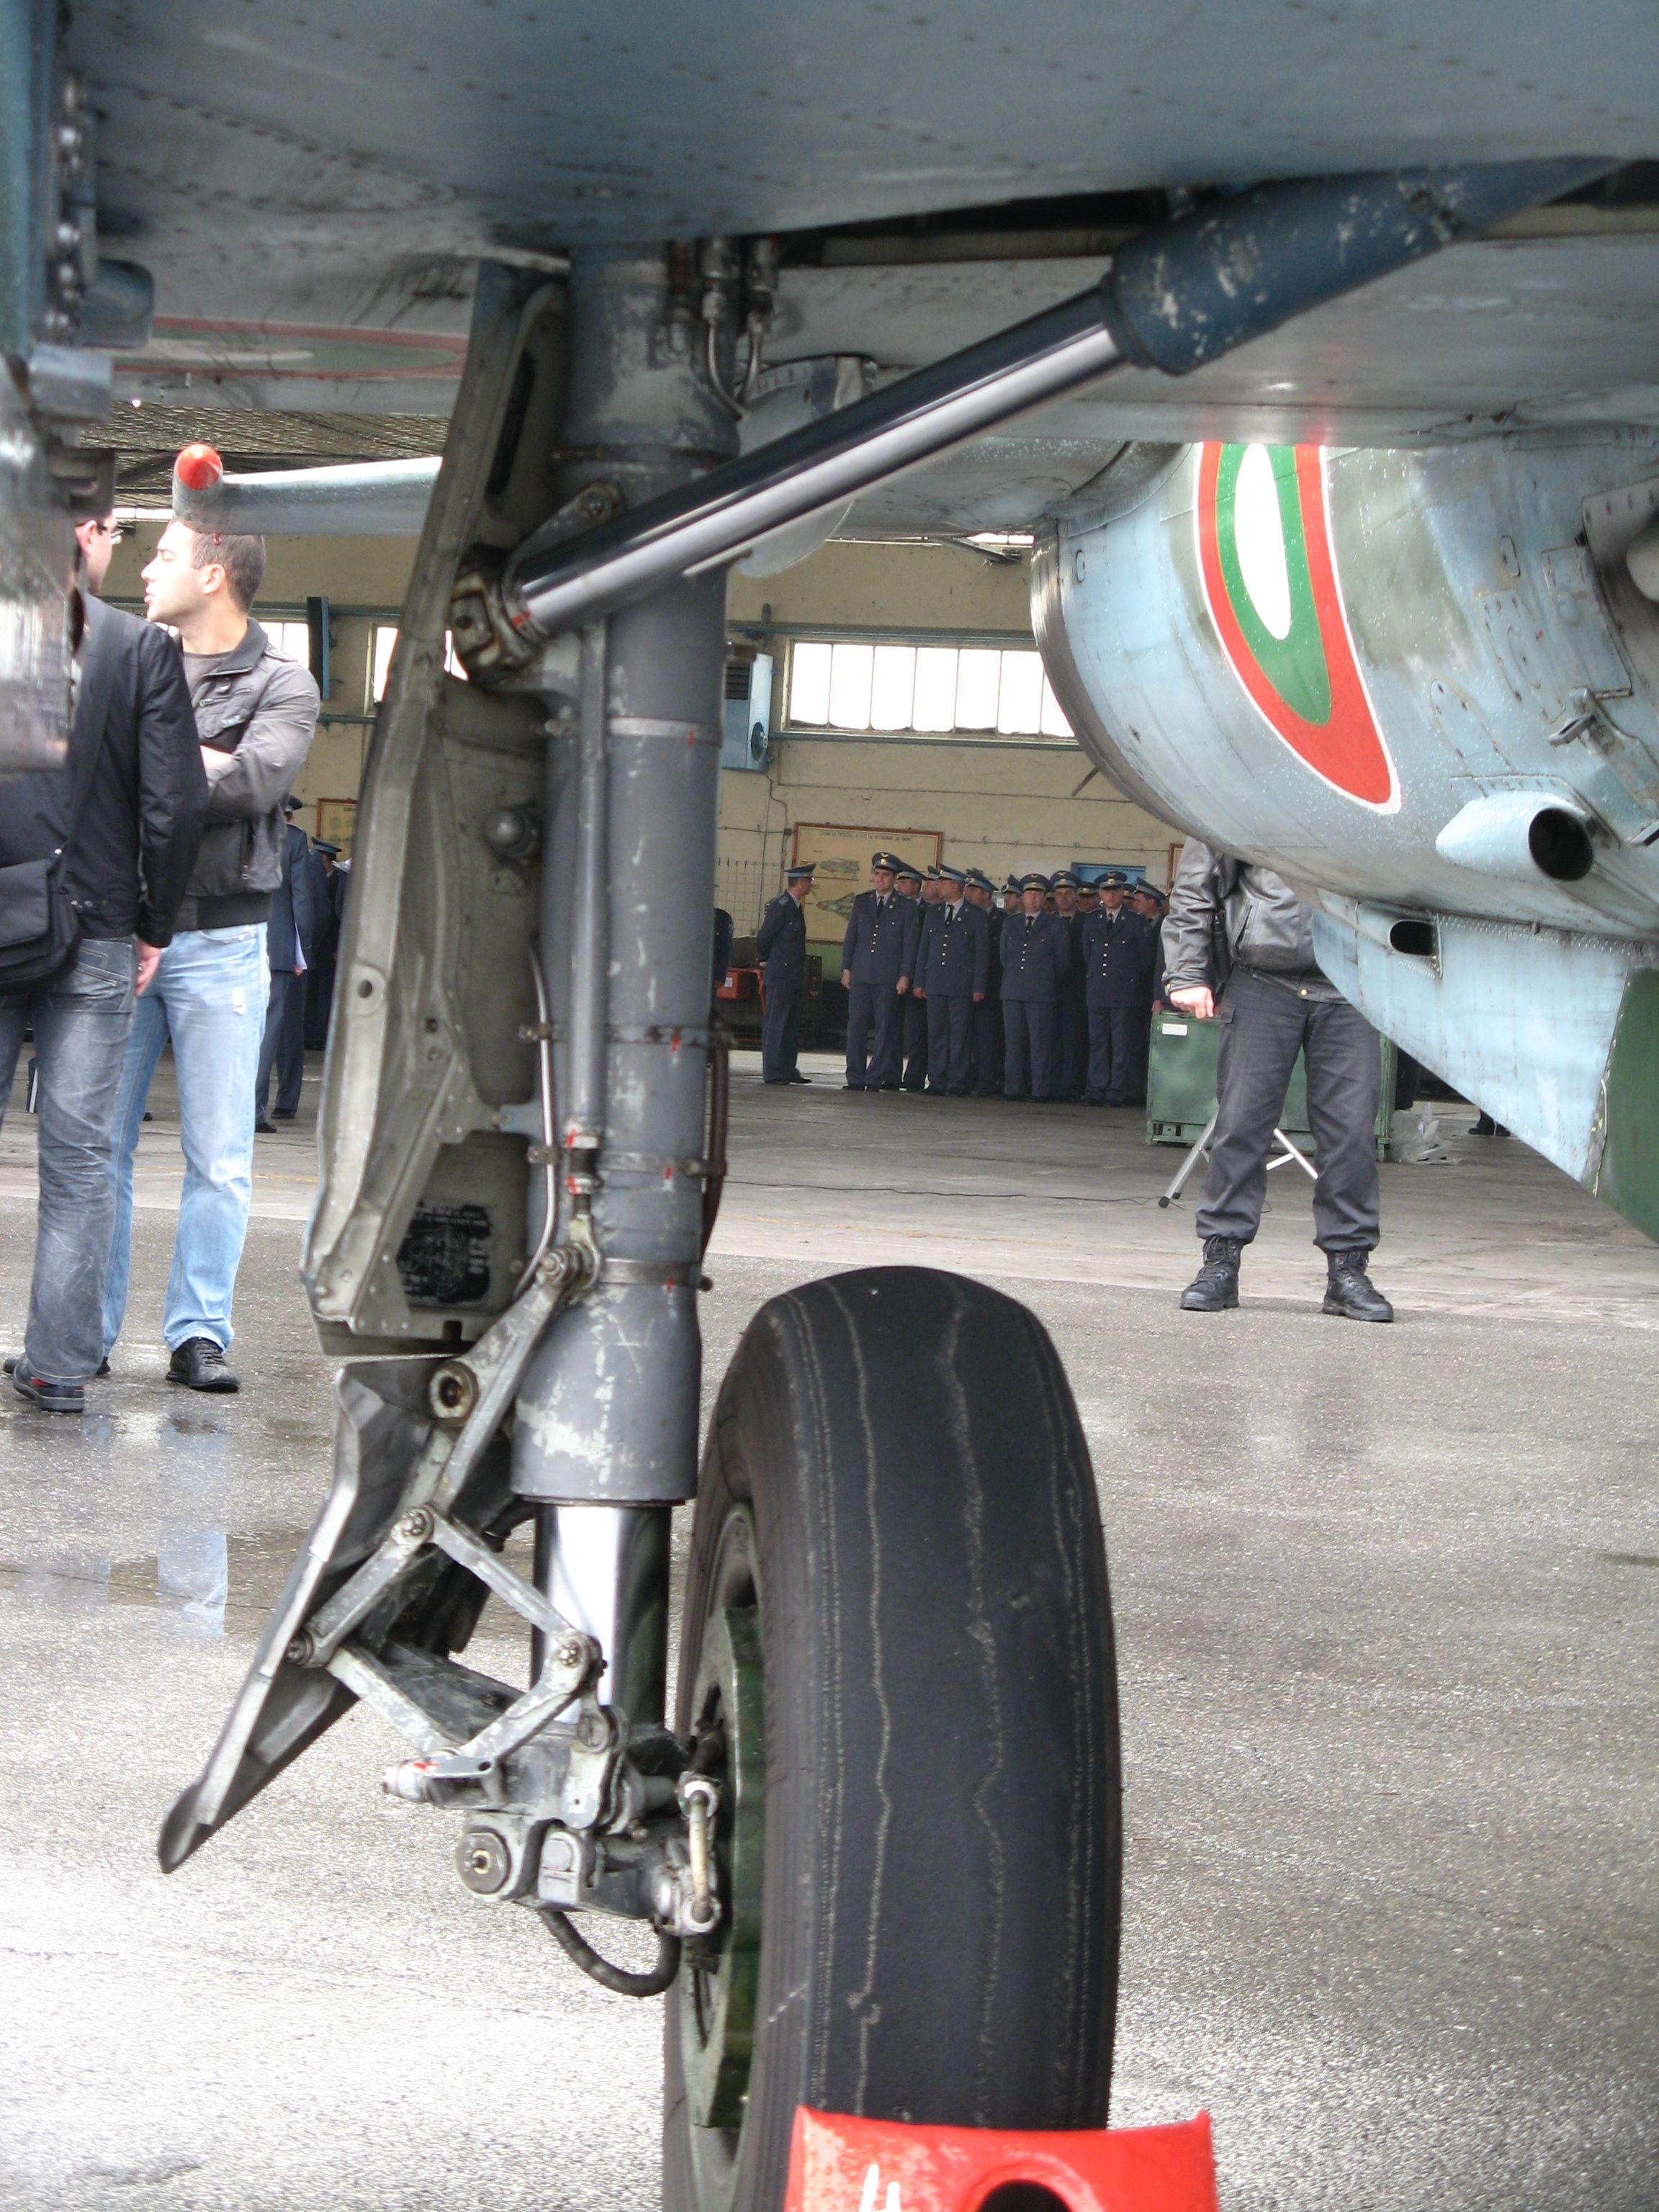 Pin by Manuel Bicudo on abandoned MIG Mig 21, Aircraft